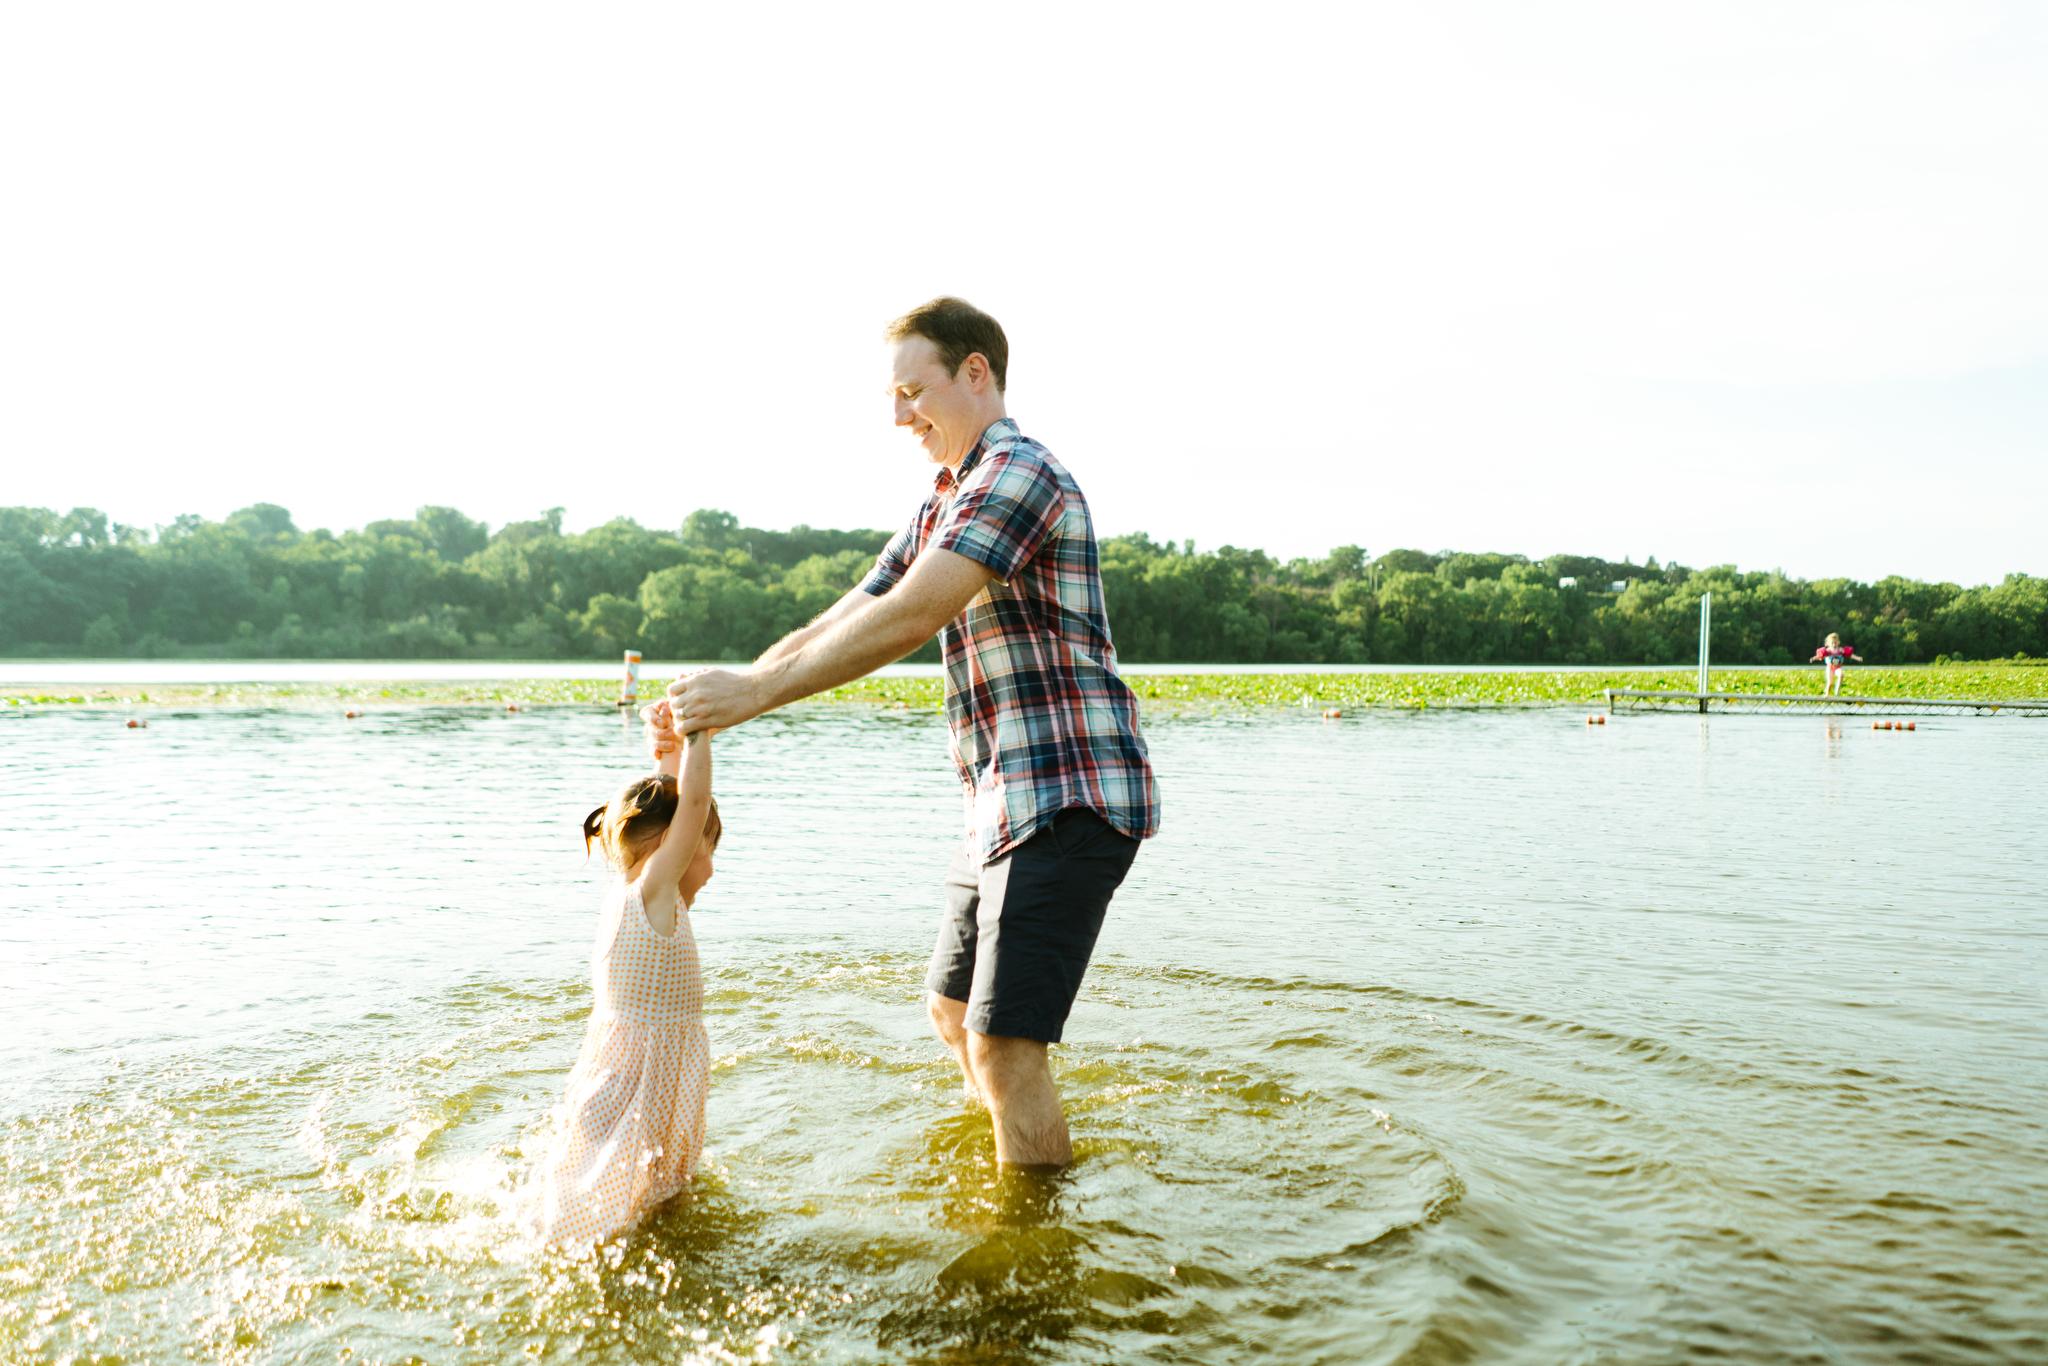 Family Photos at Green Lake in Seattle, Washington